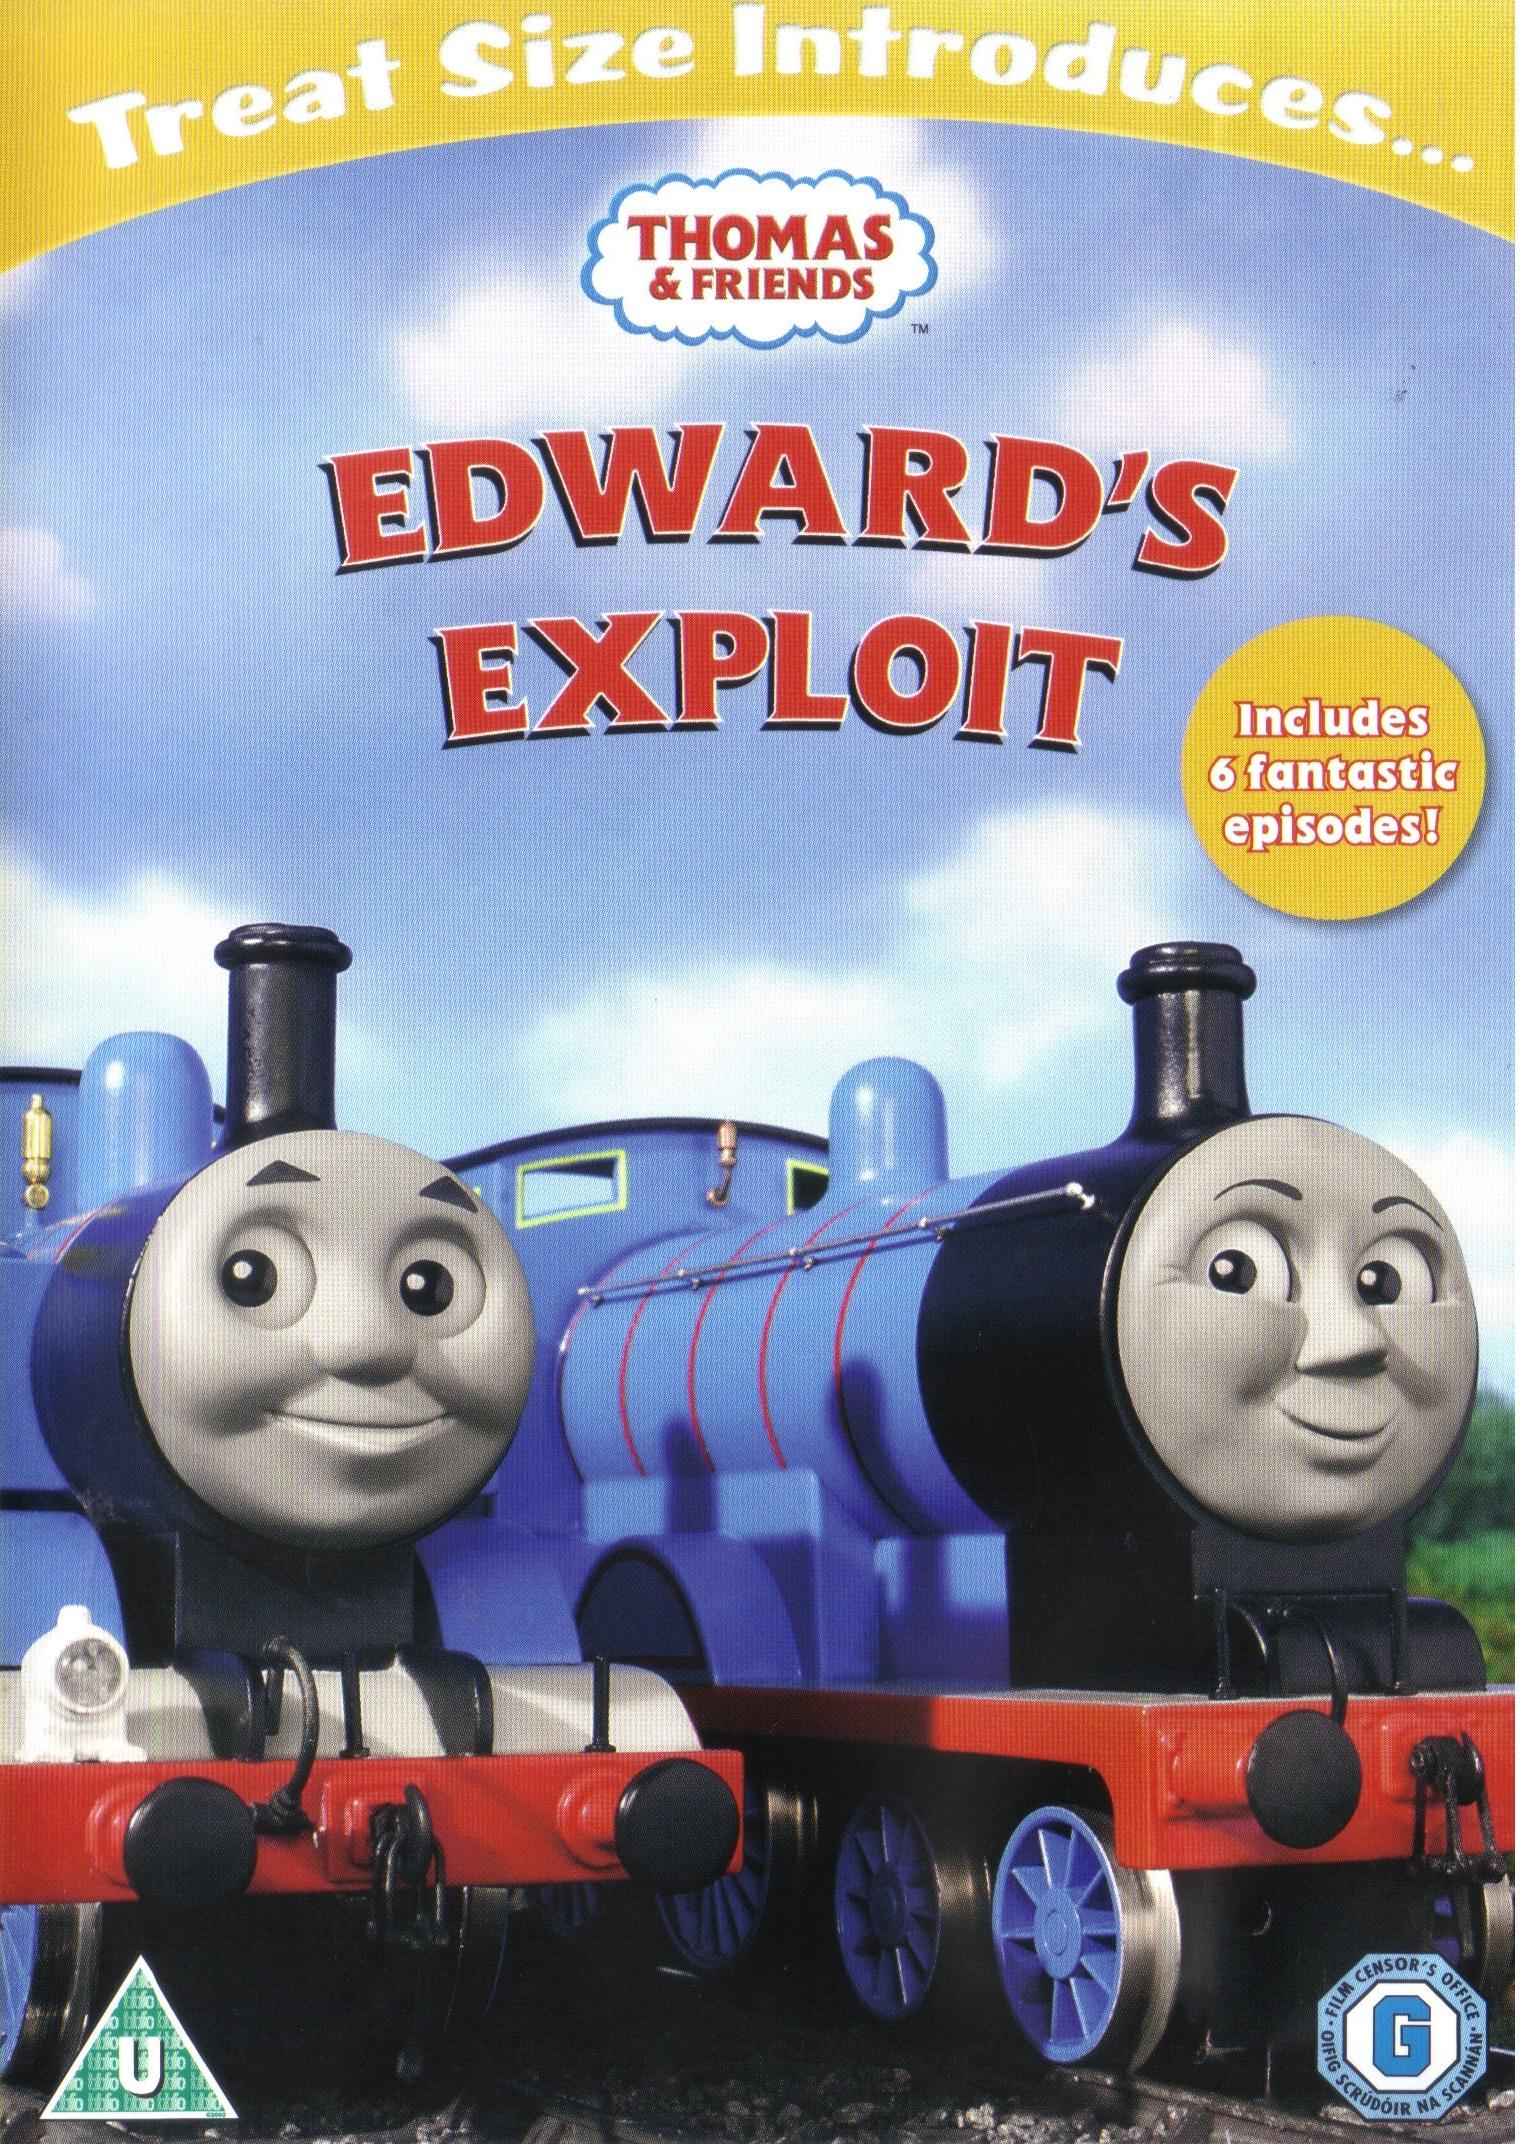 Edward's Exploit (UK DVD)